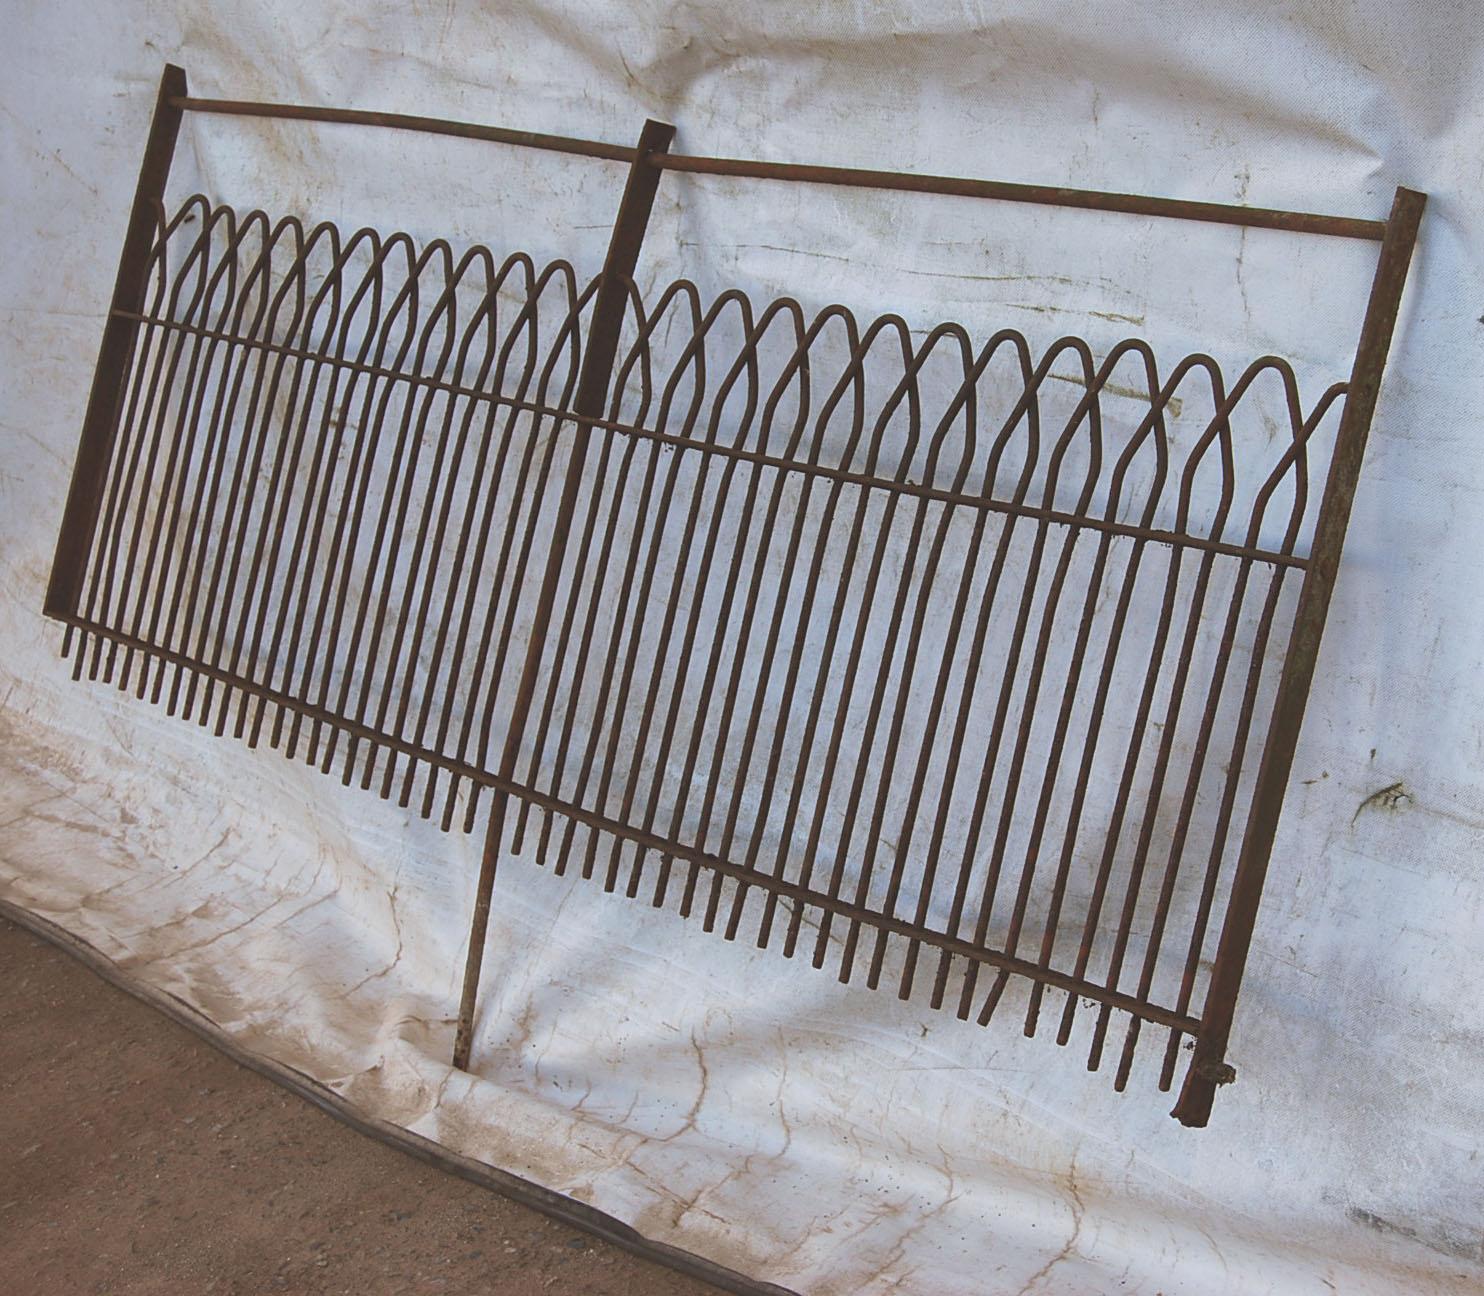 A good run of antique wrought iron estate fencing-72794